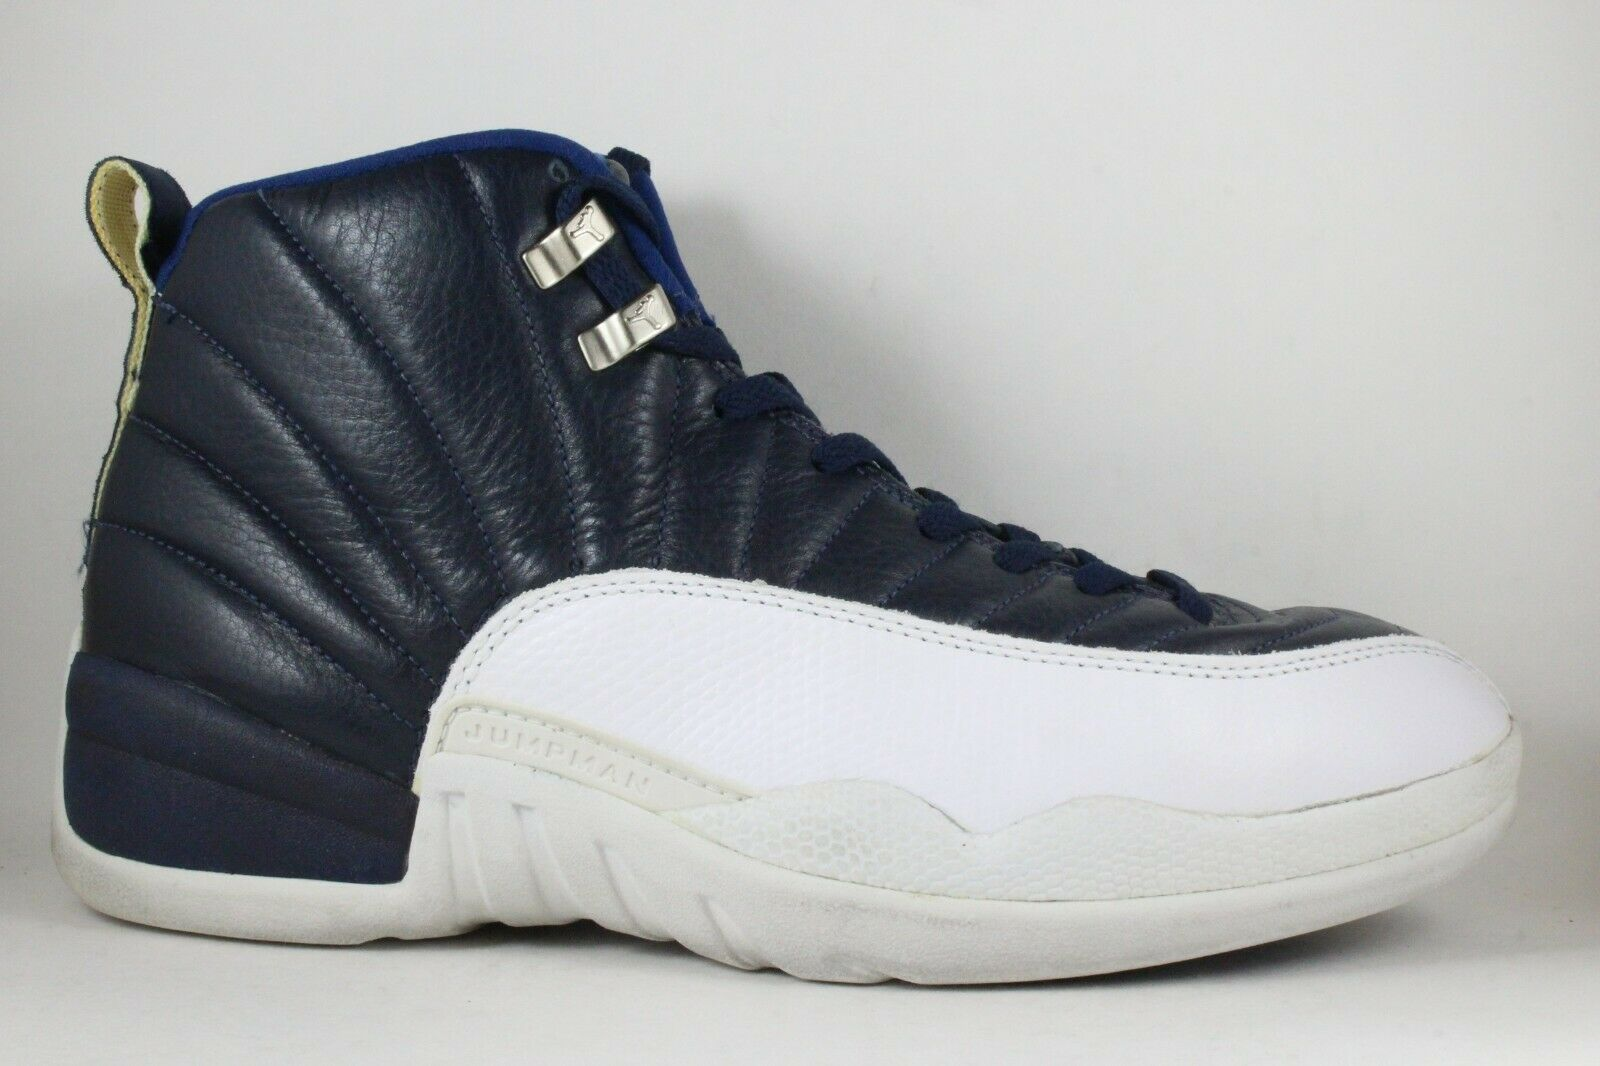 f5aba0f92c9 1997 Nike Air Jordan 12 Retro Obsidian bluee White size 10.5 OG XII ...